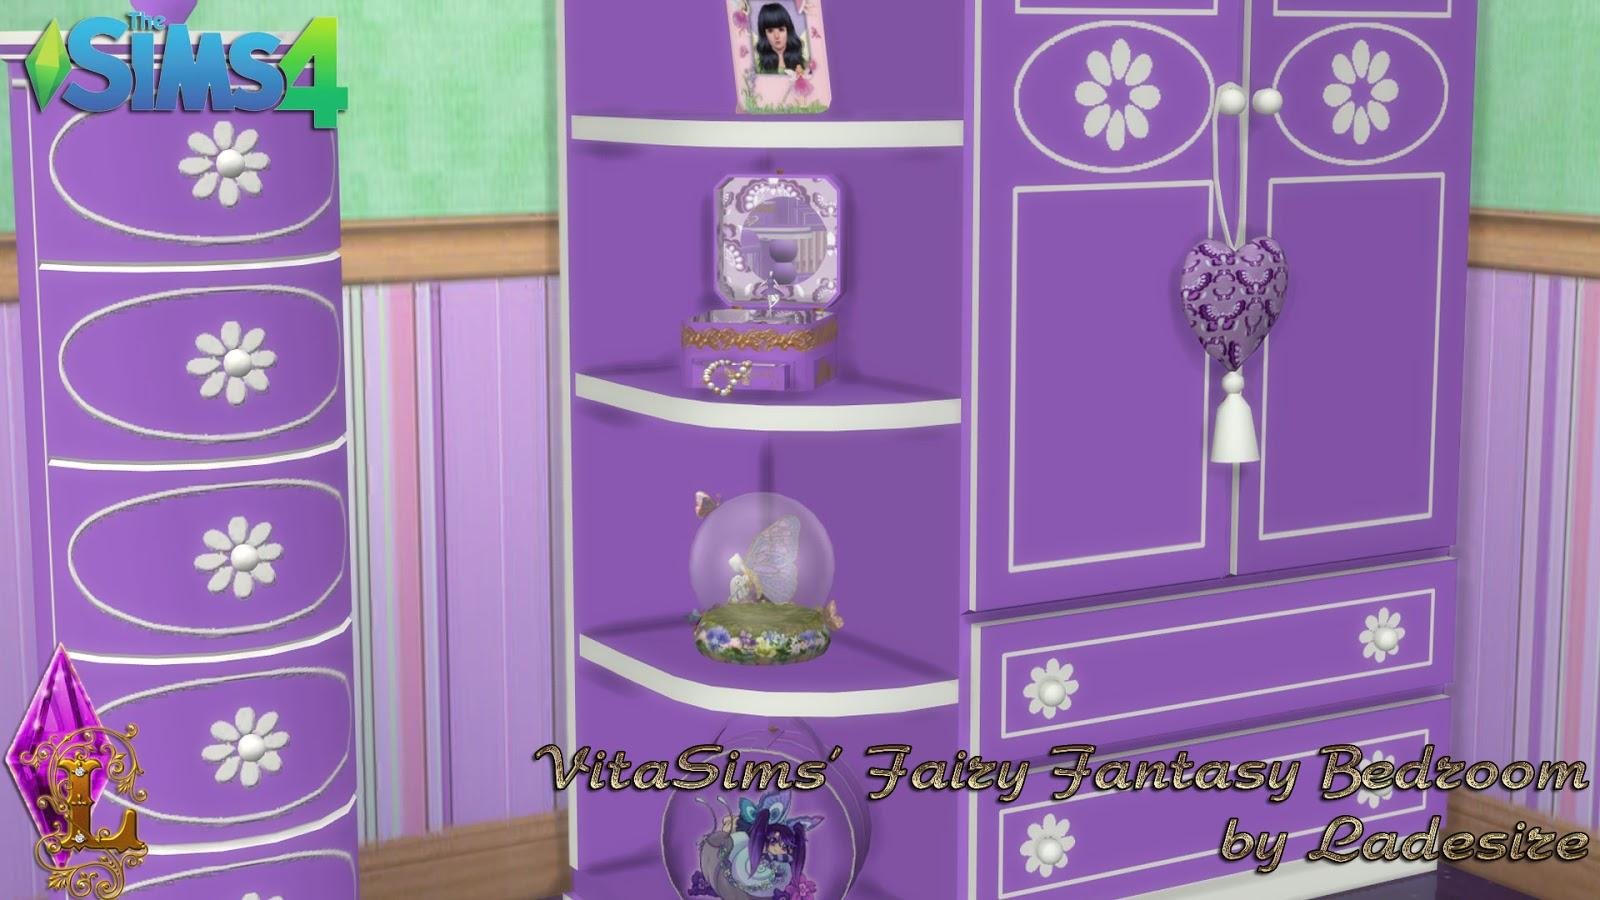 Ladesire S Creative Corner Ts4 Vitasims Fairy Fantasy